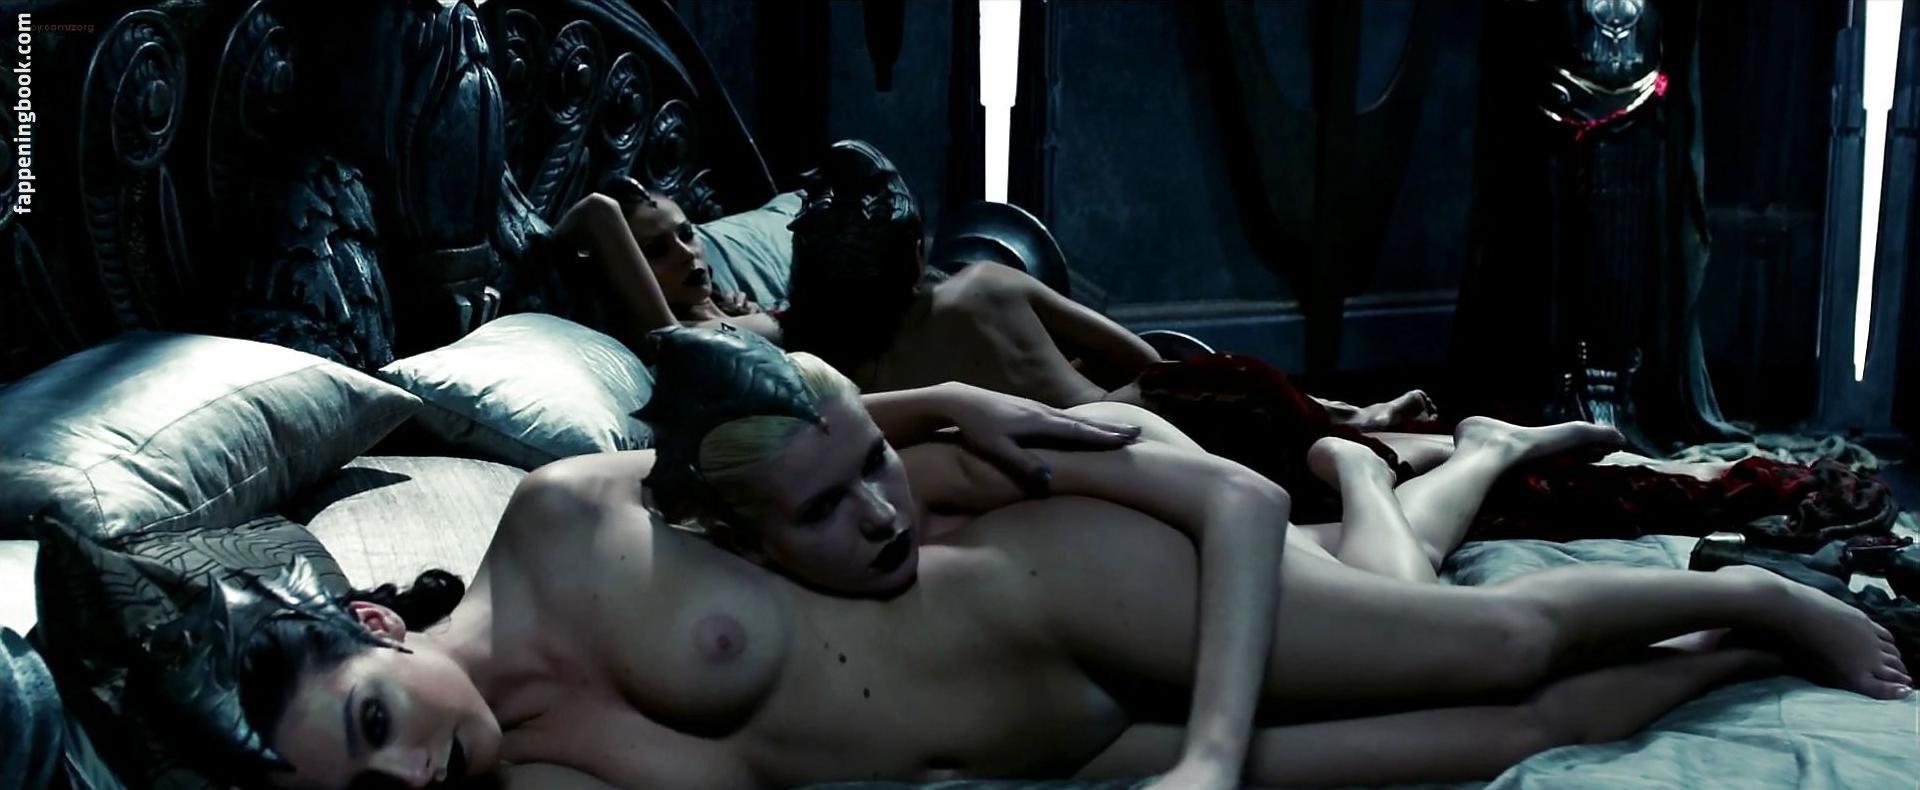 Sweetie helga grey nude in the blue room unrated xxx galleries full hd